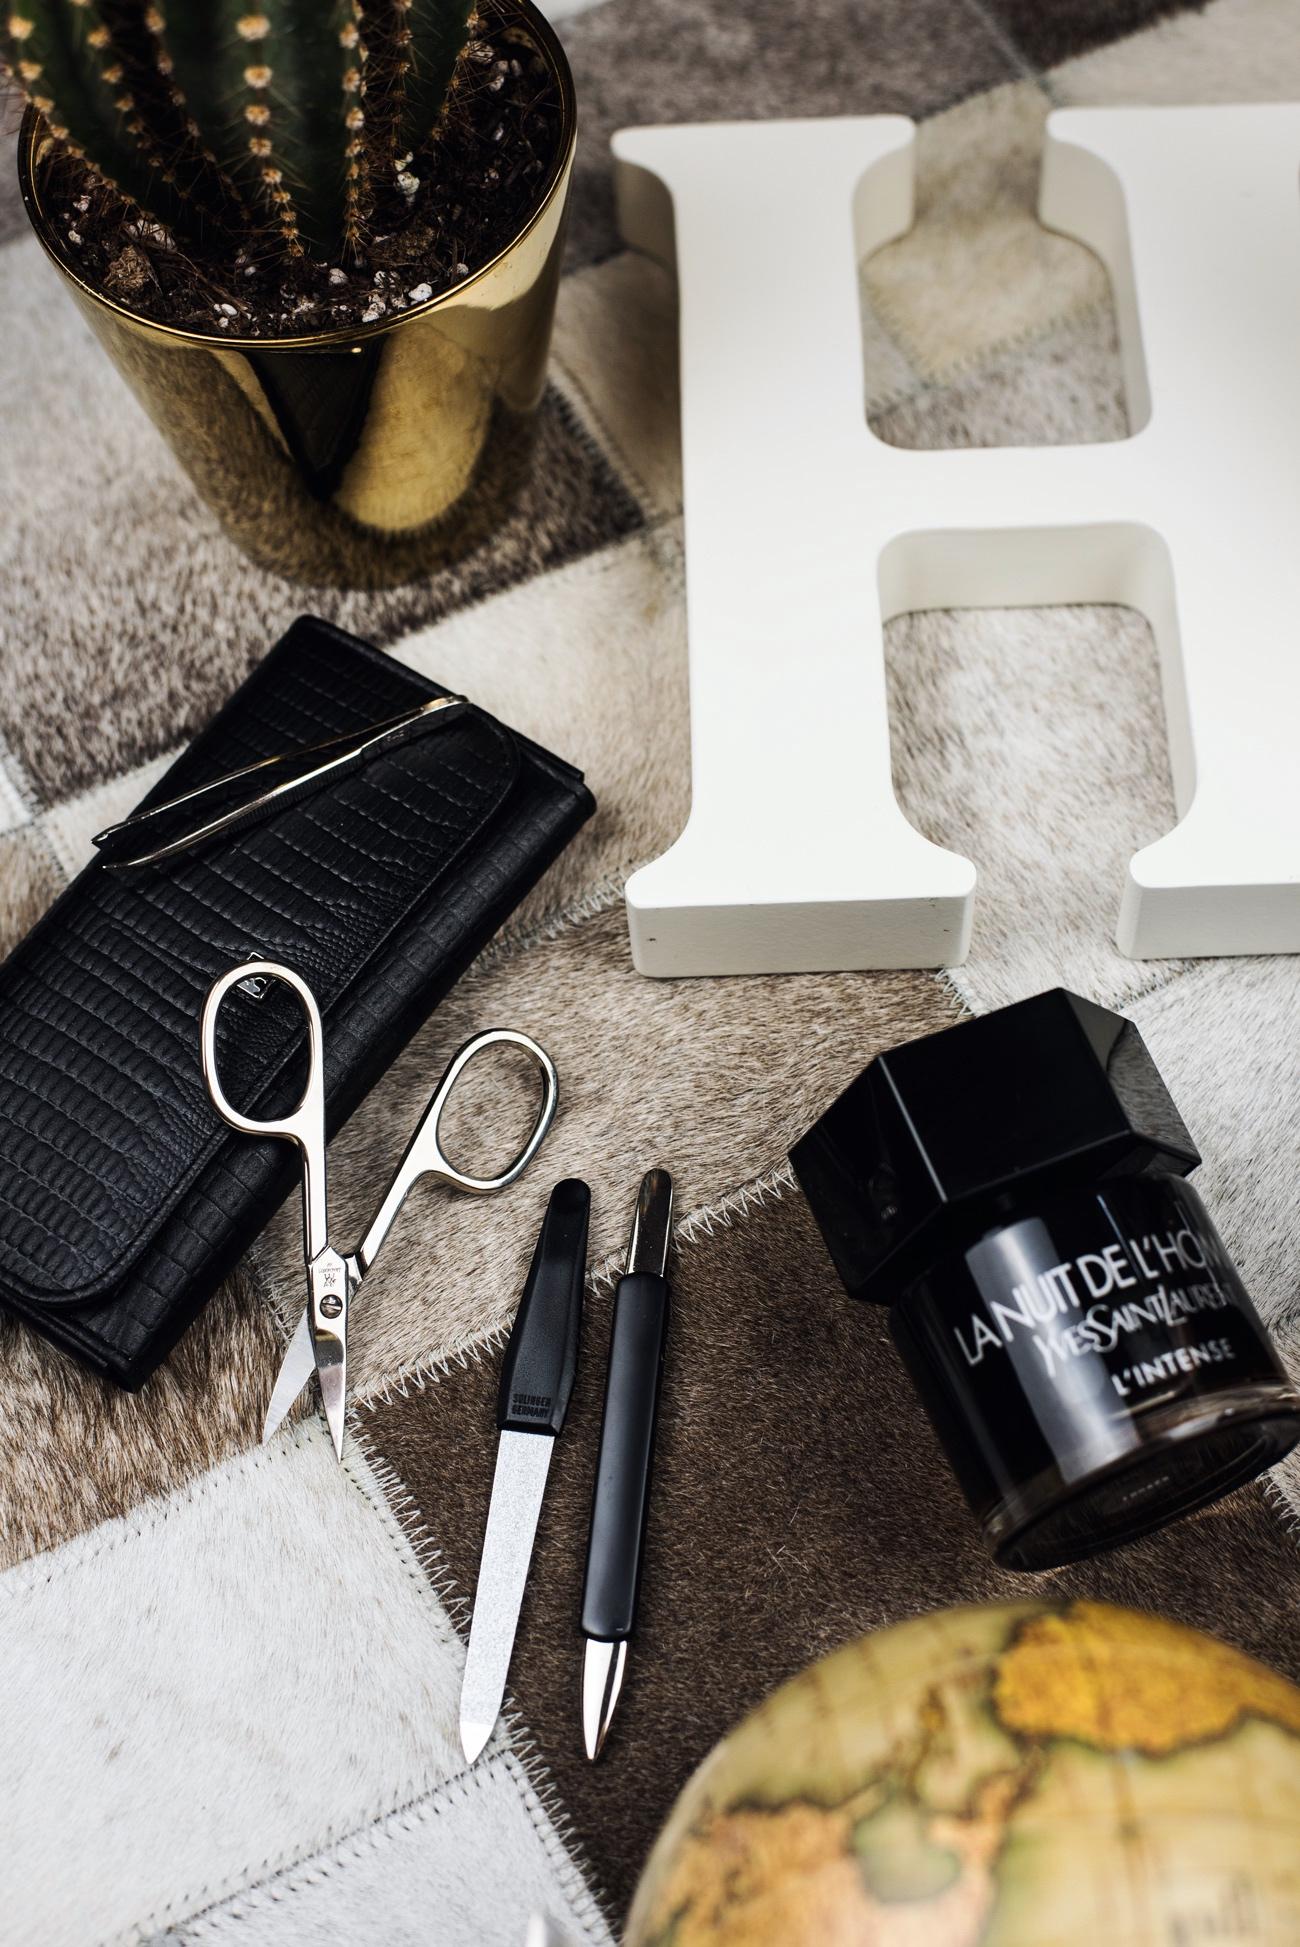 geschenk-ideen-für-den-freund-mann-kosmetik-beauty-sachen-blogger-freunde-fashiioncarpet